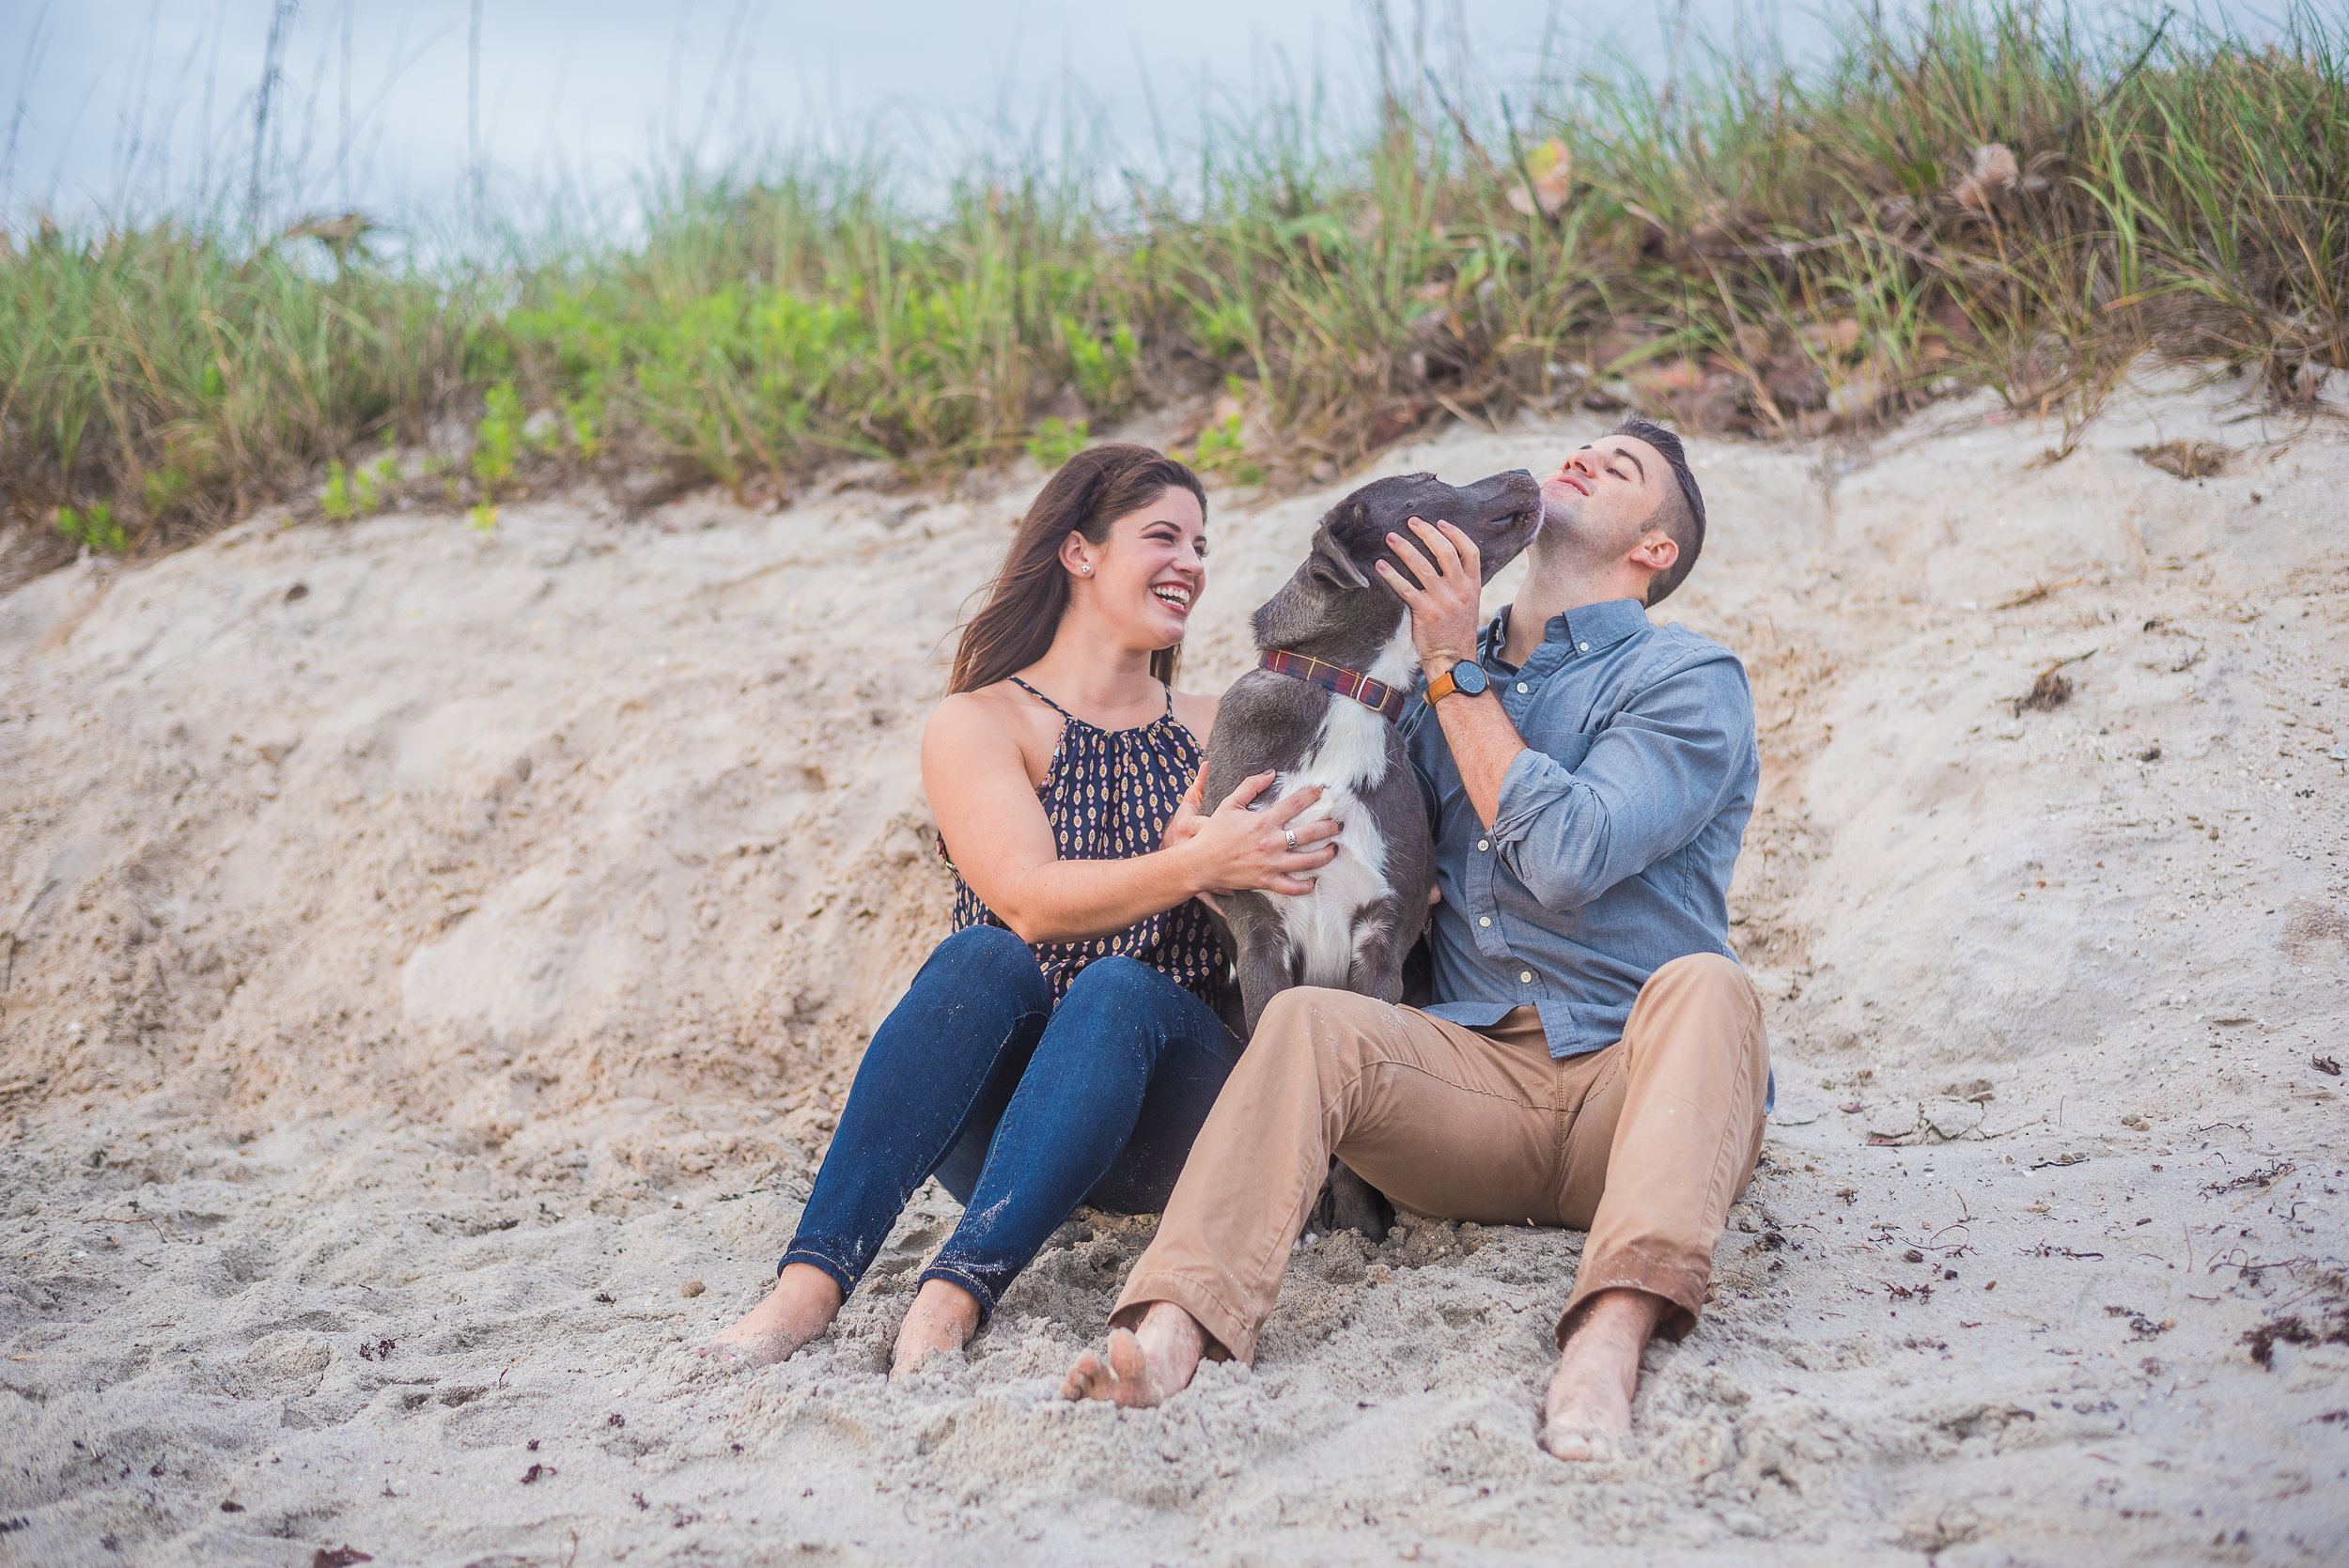 jenna-florida-beach-engagement-photo-1-2.jpg